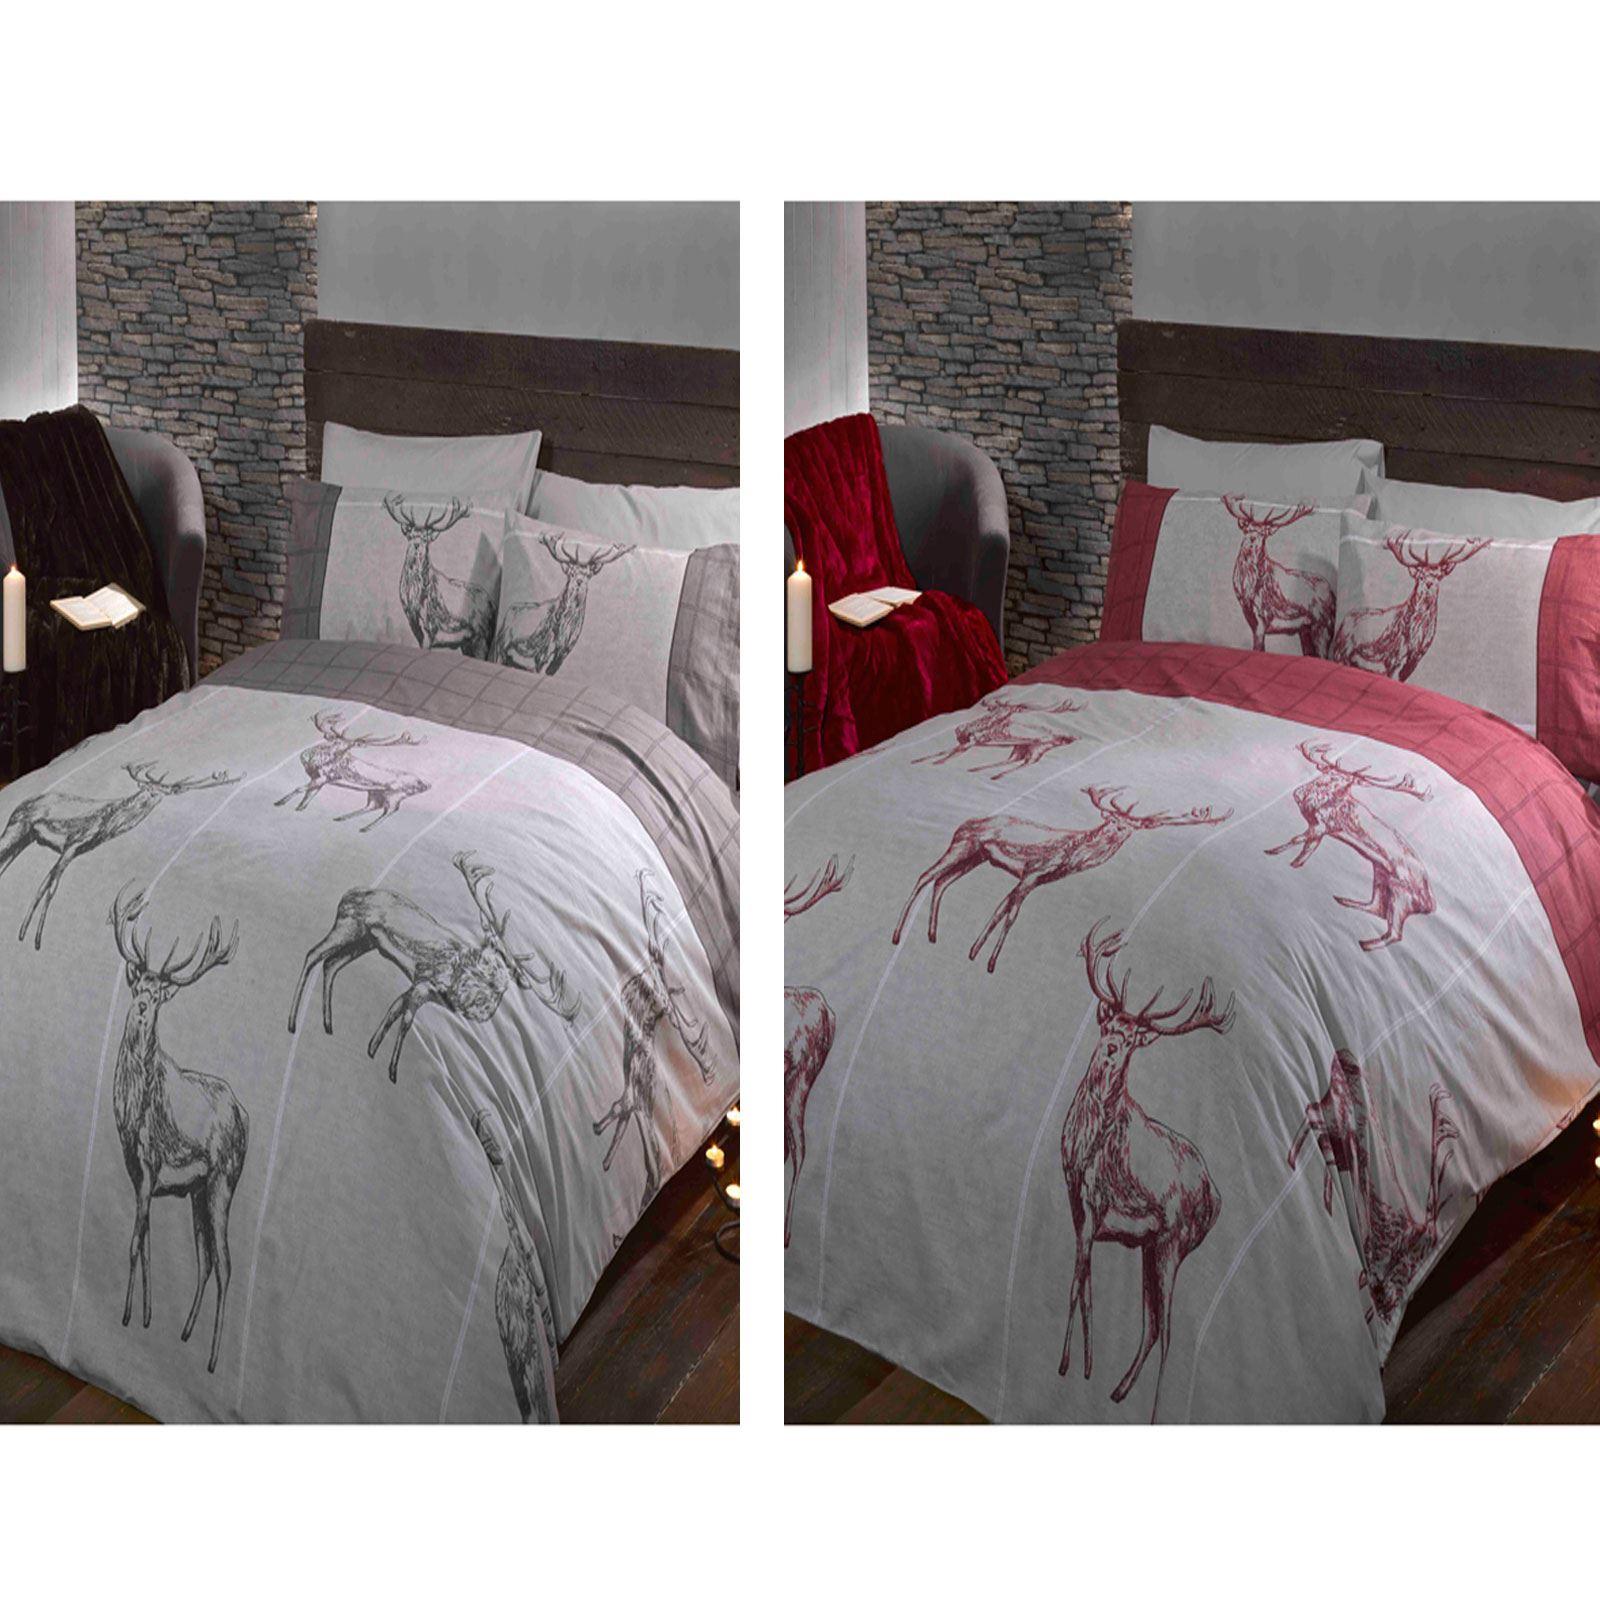 juno striped grey bedding set double tokida for